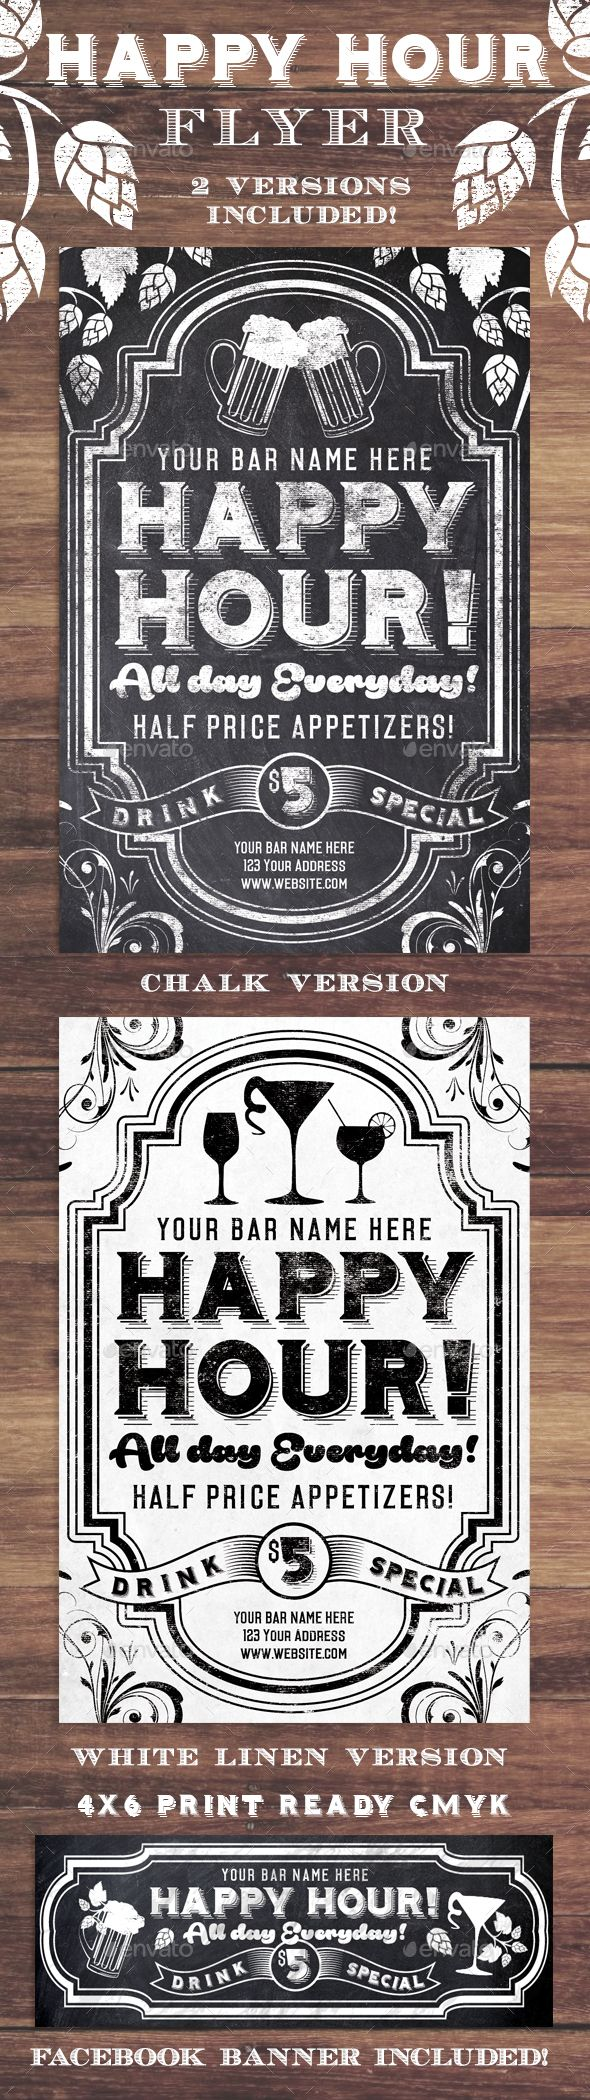 Chalk Happy Hour Flyer Invite Template PSD #design Download: http://graphicriver.net/item/chalk-happy-hour-flyer-invite/14031565?ref=ksioks